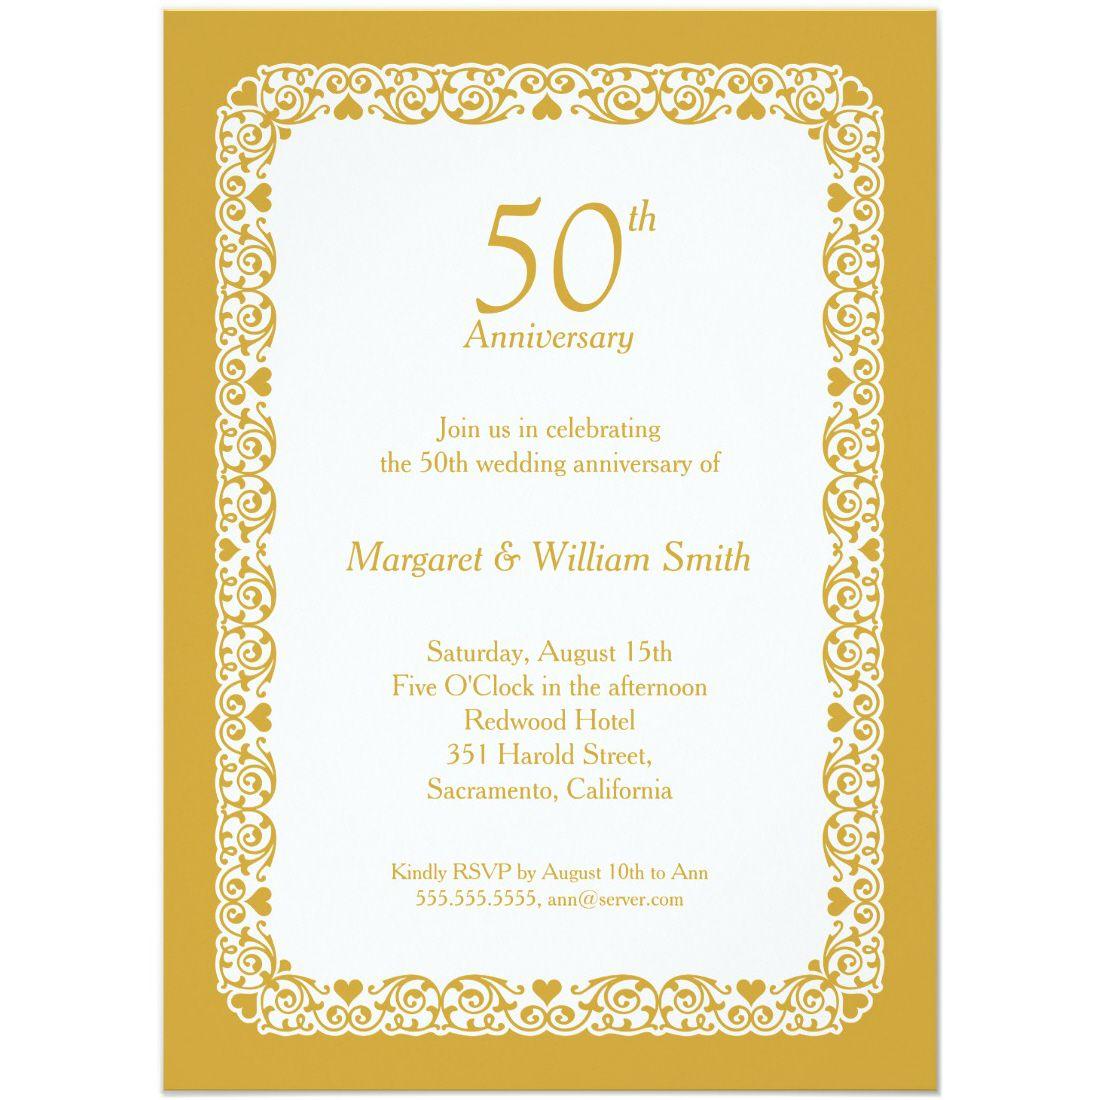 Elegant lace wedding anniversary invitation Custom Colors | Wedding ...